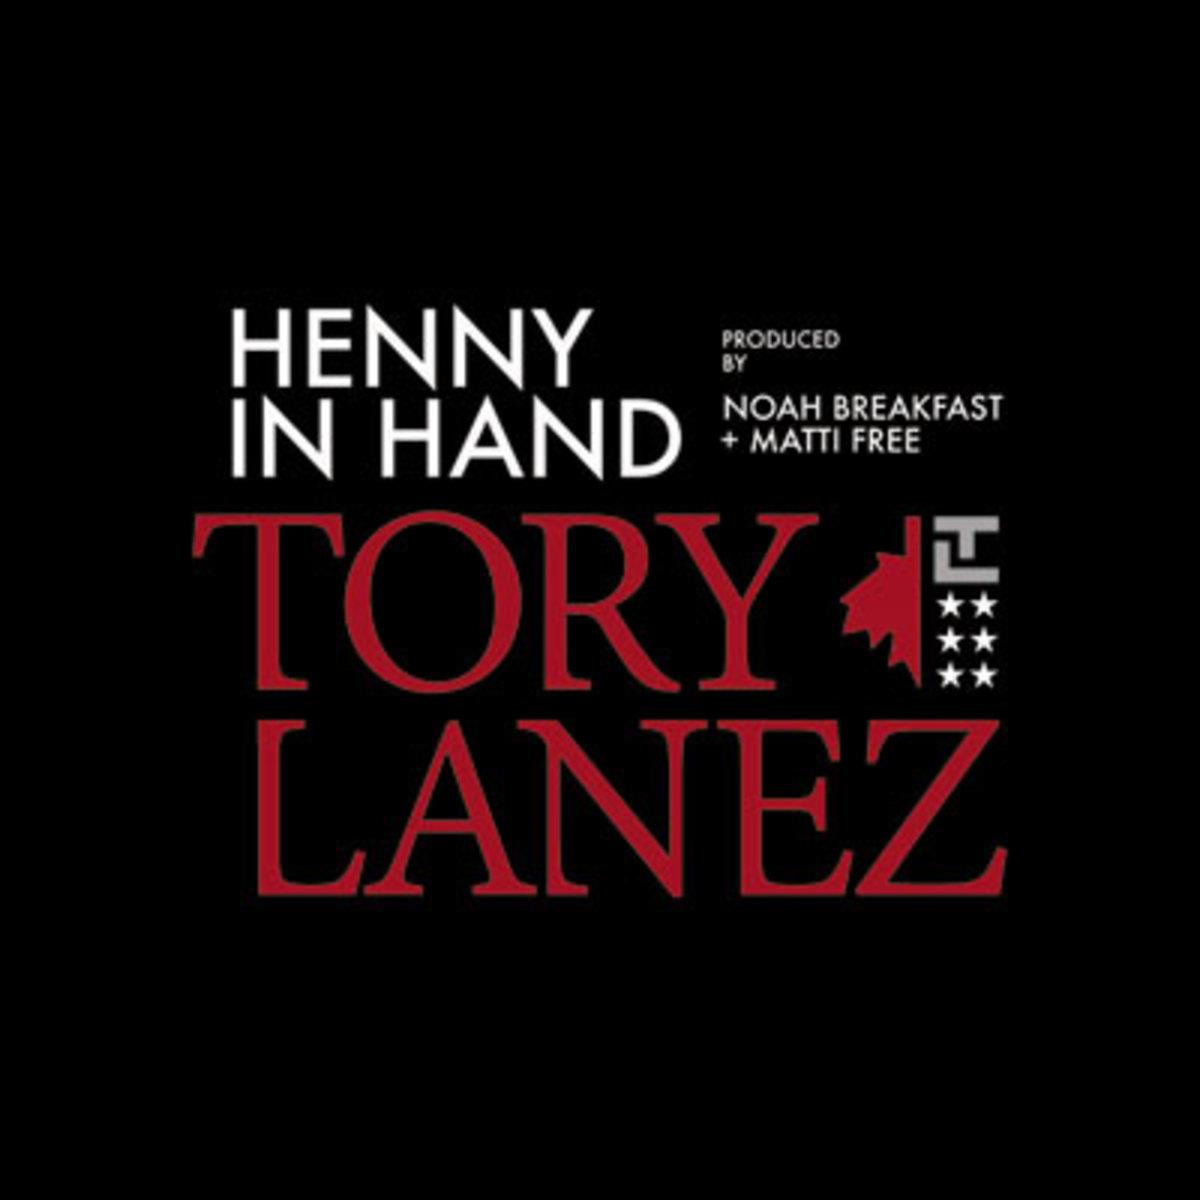 torylanez-hennyhand.jpg